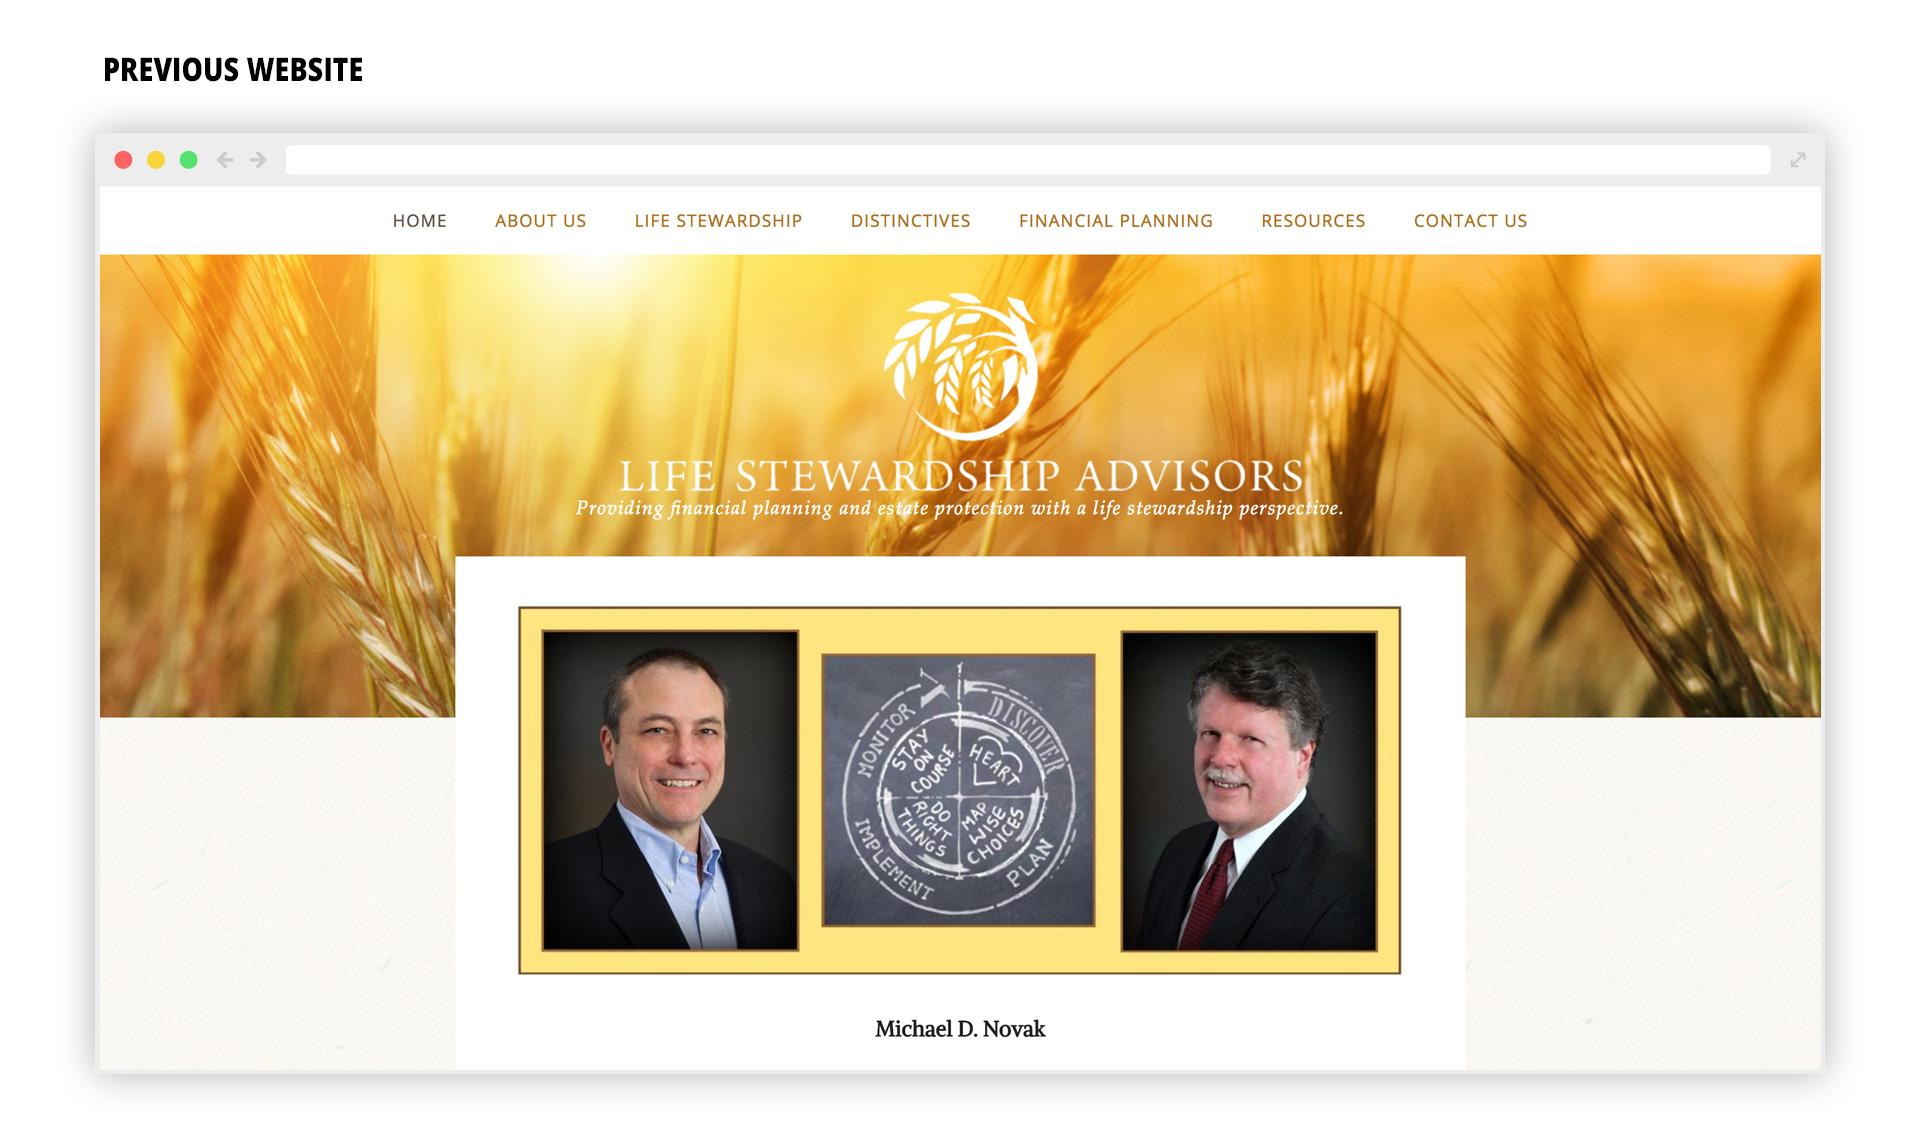 LSA - Previous Website